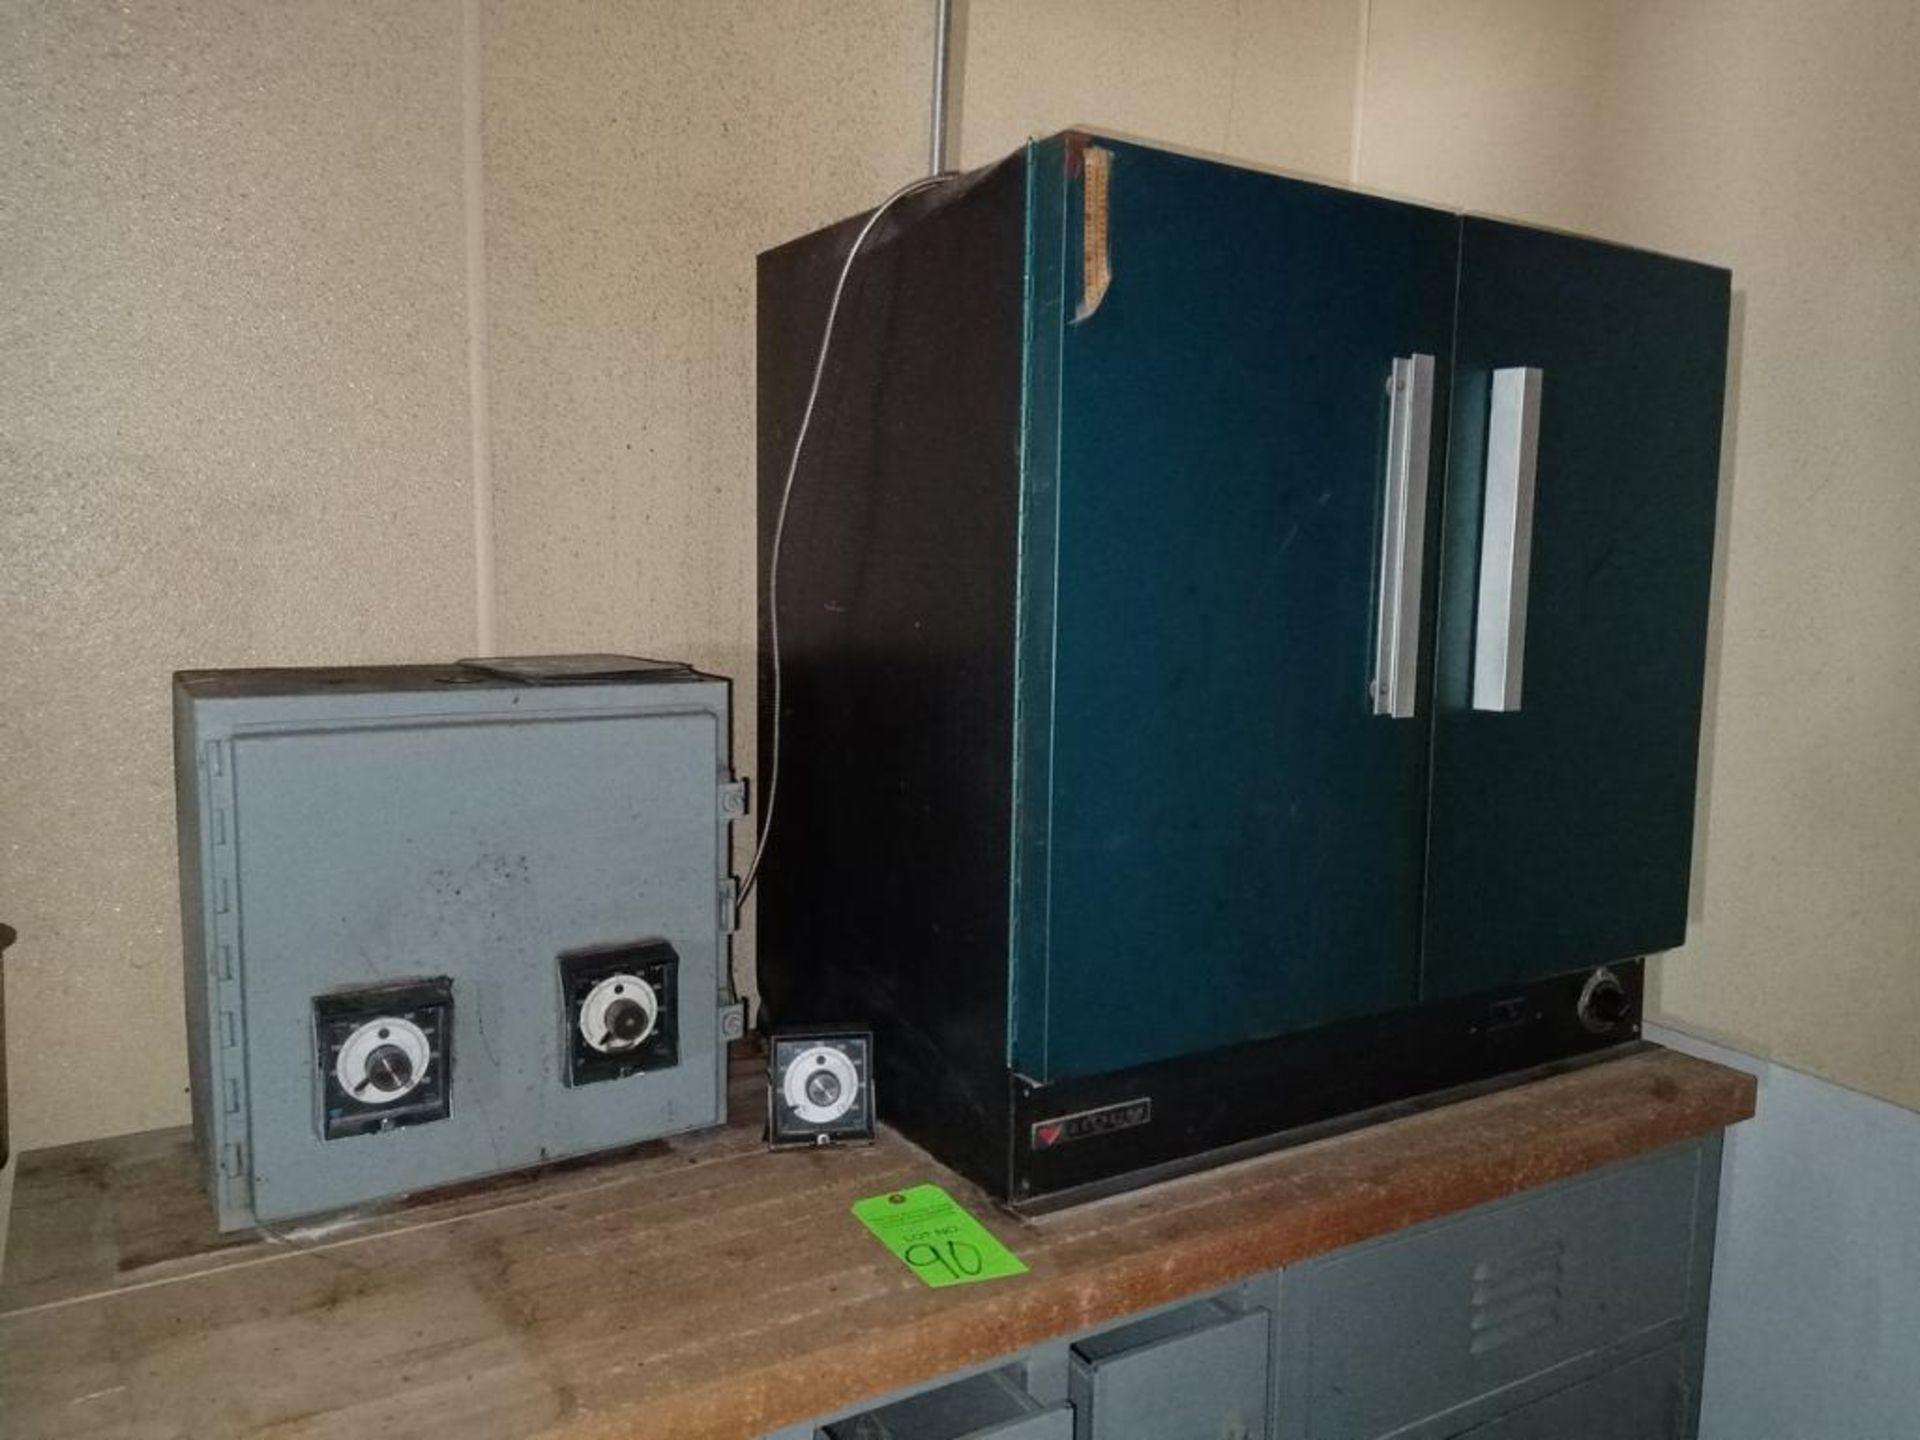 Lot 90 - Despatch Laboratory Oven